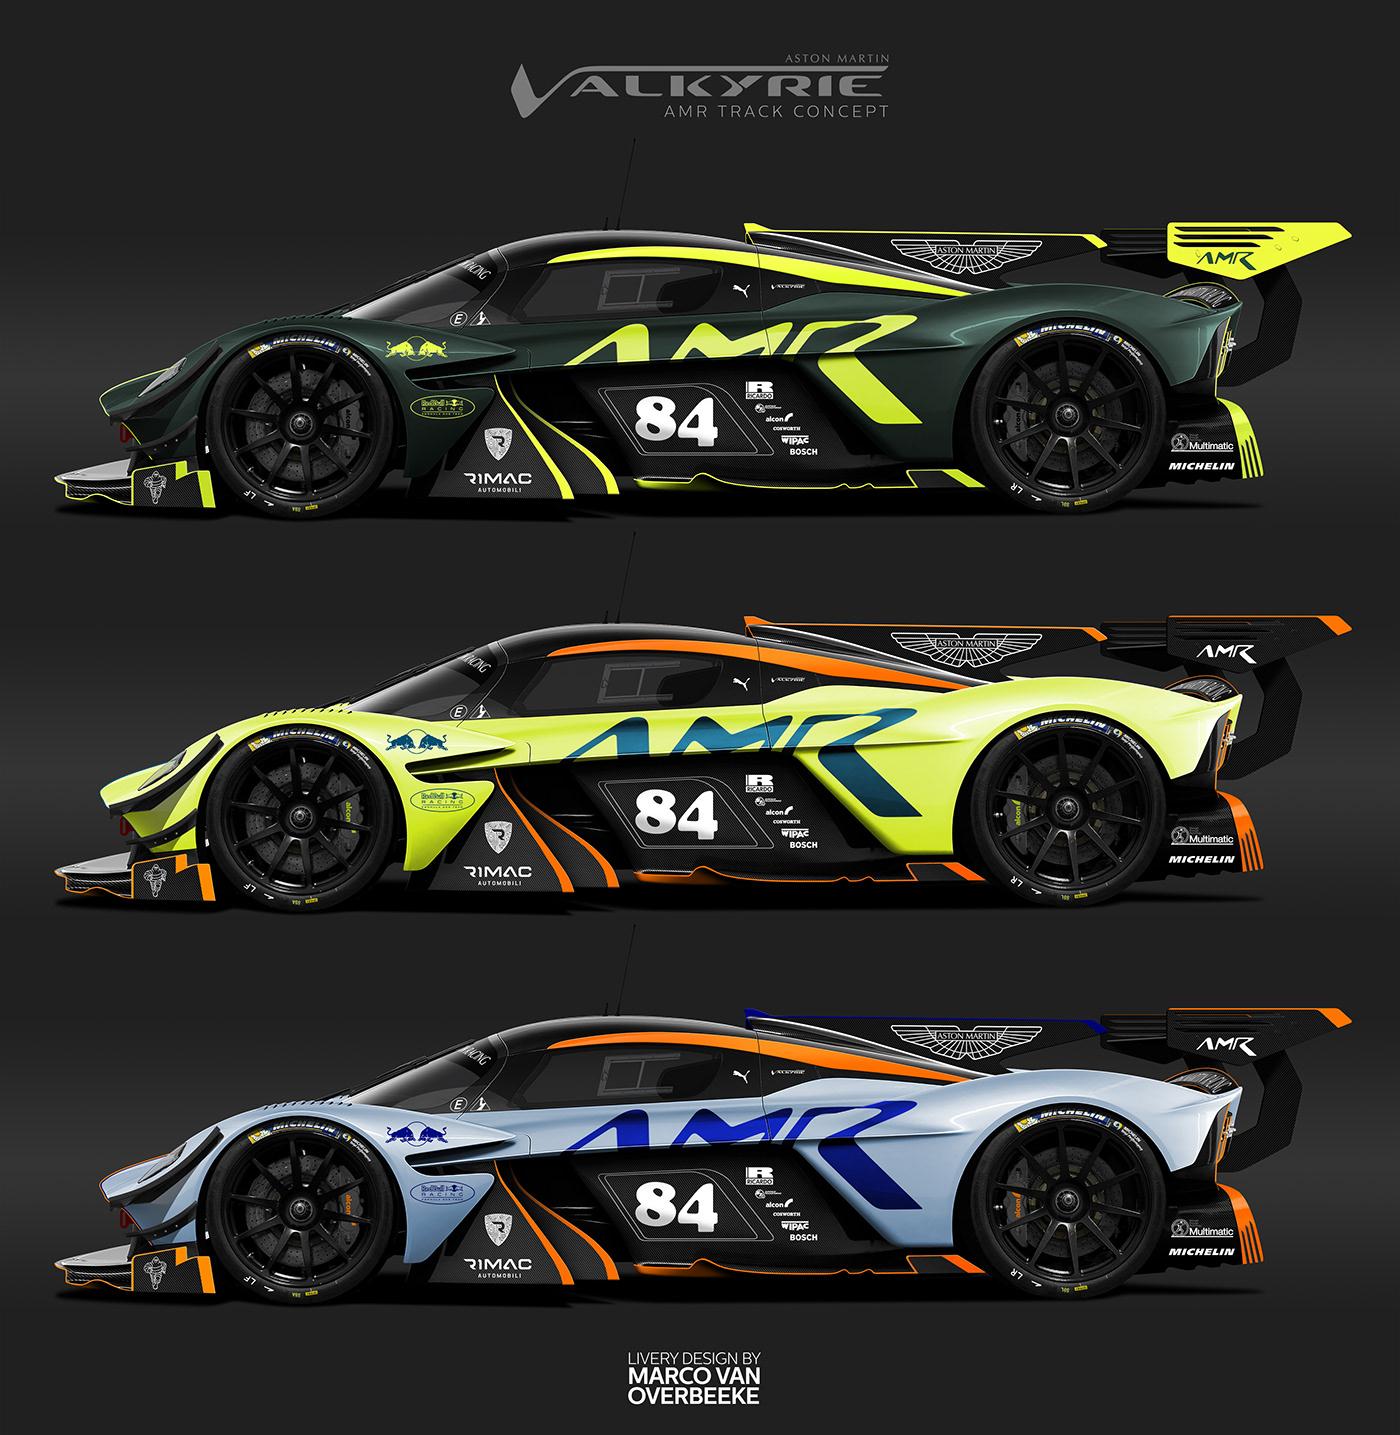 Aston Martin Valkyrie Sport: Aston Martin Valkyrie AMR Pro Livery Concepts On Behance